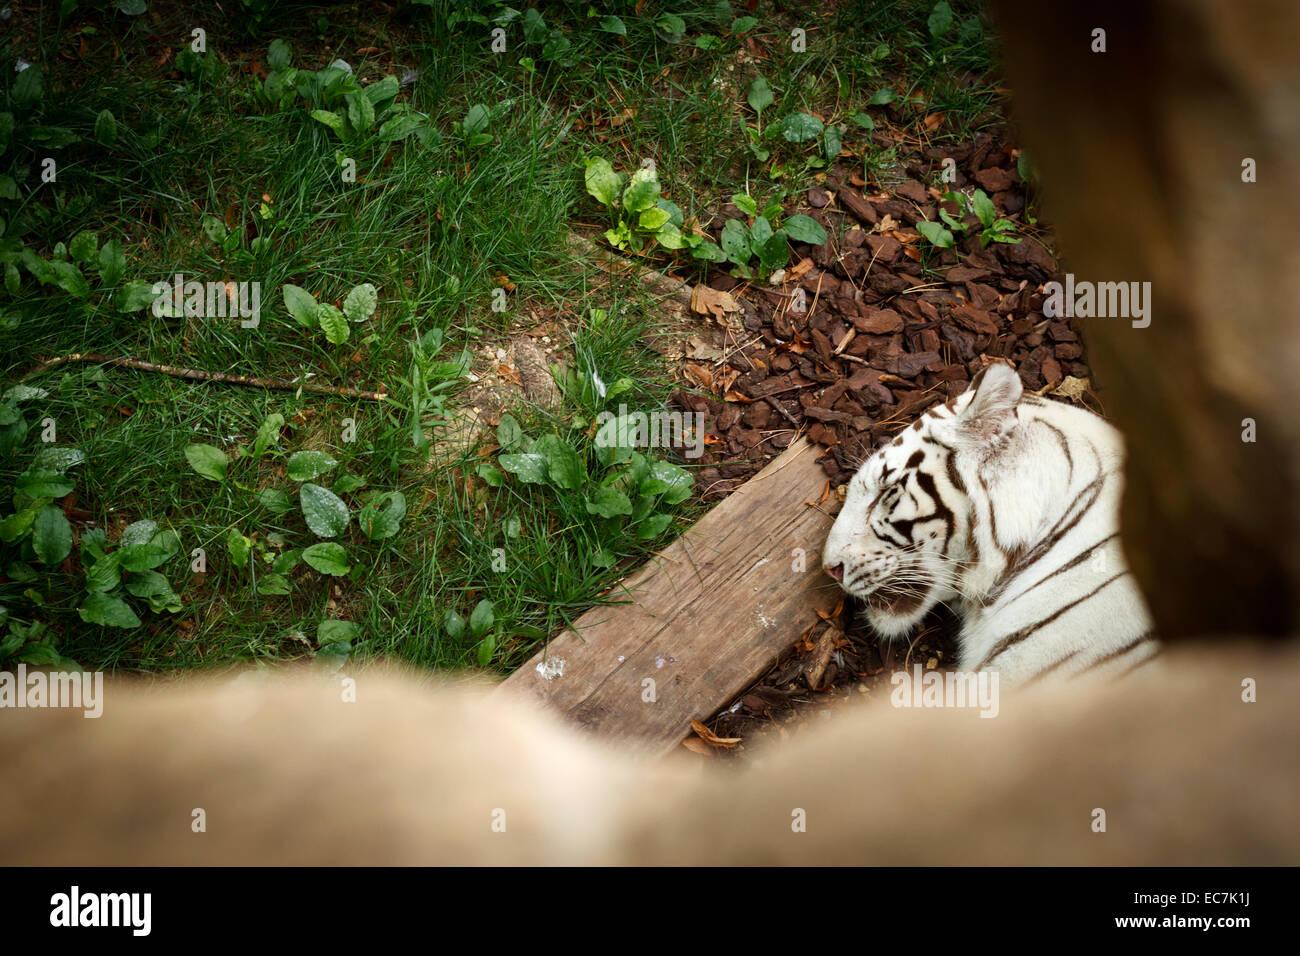 Parco zoo di Beauval rara tigre bianca, Francia. Immagini Stock